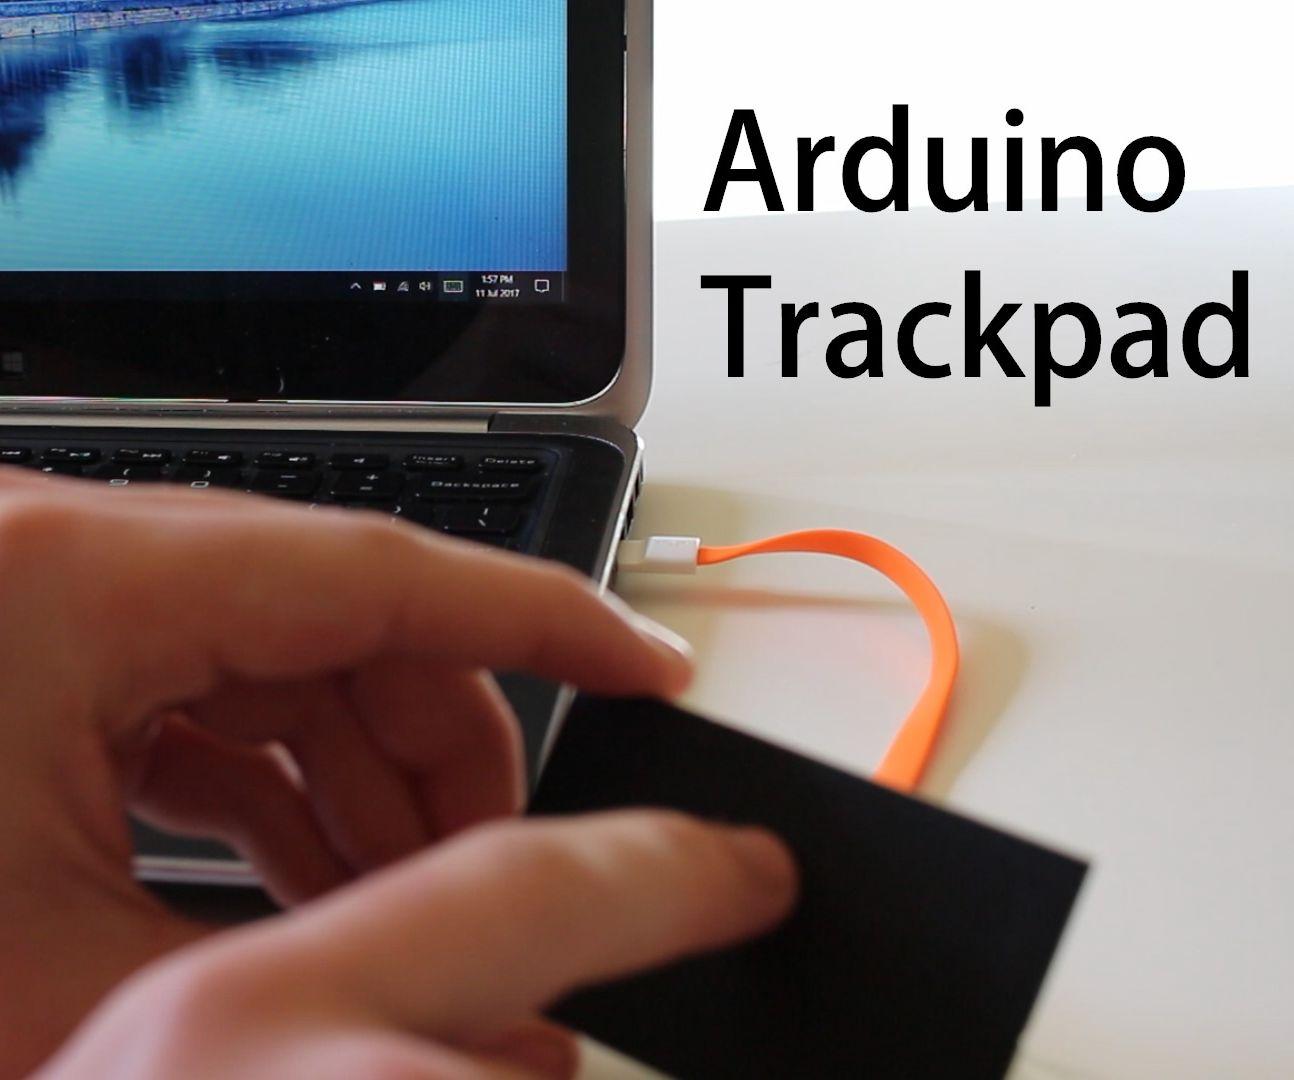 Arduino Controlled USB Trackpad